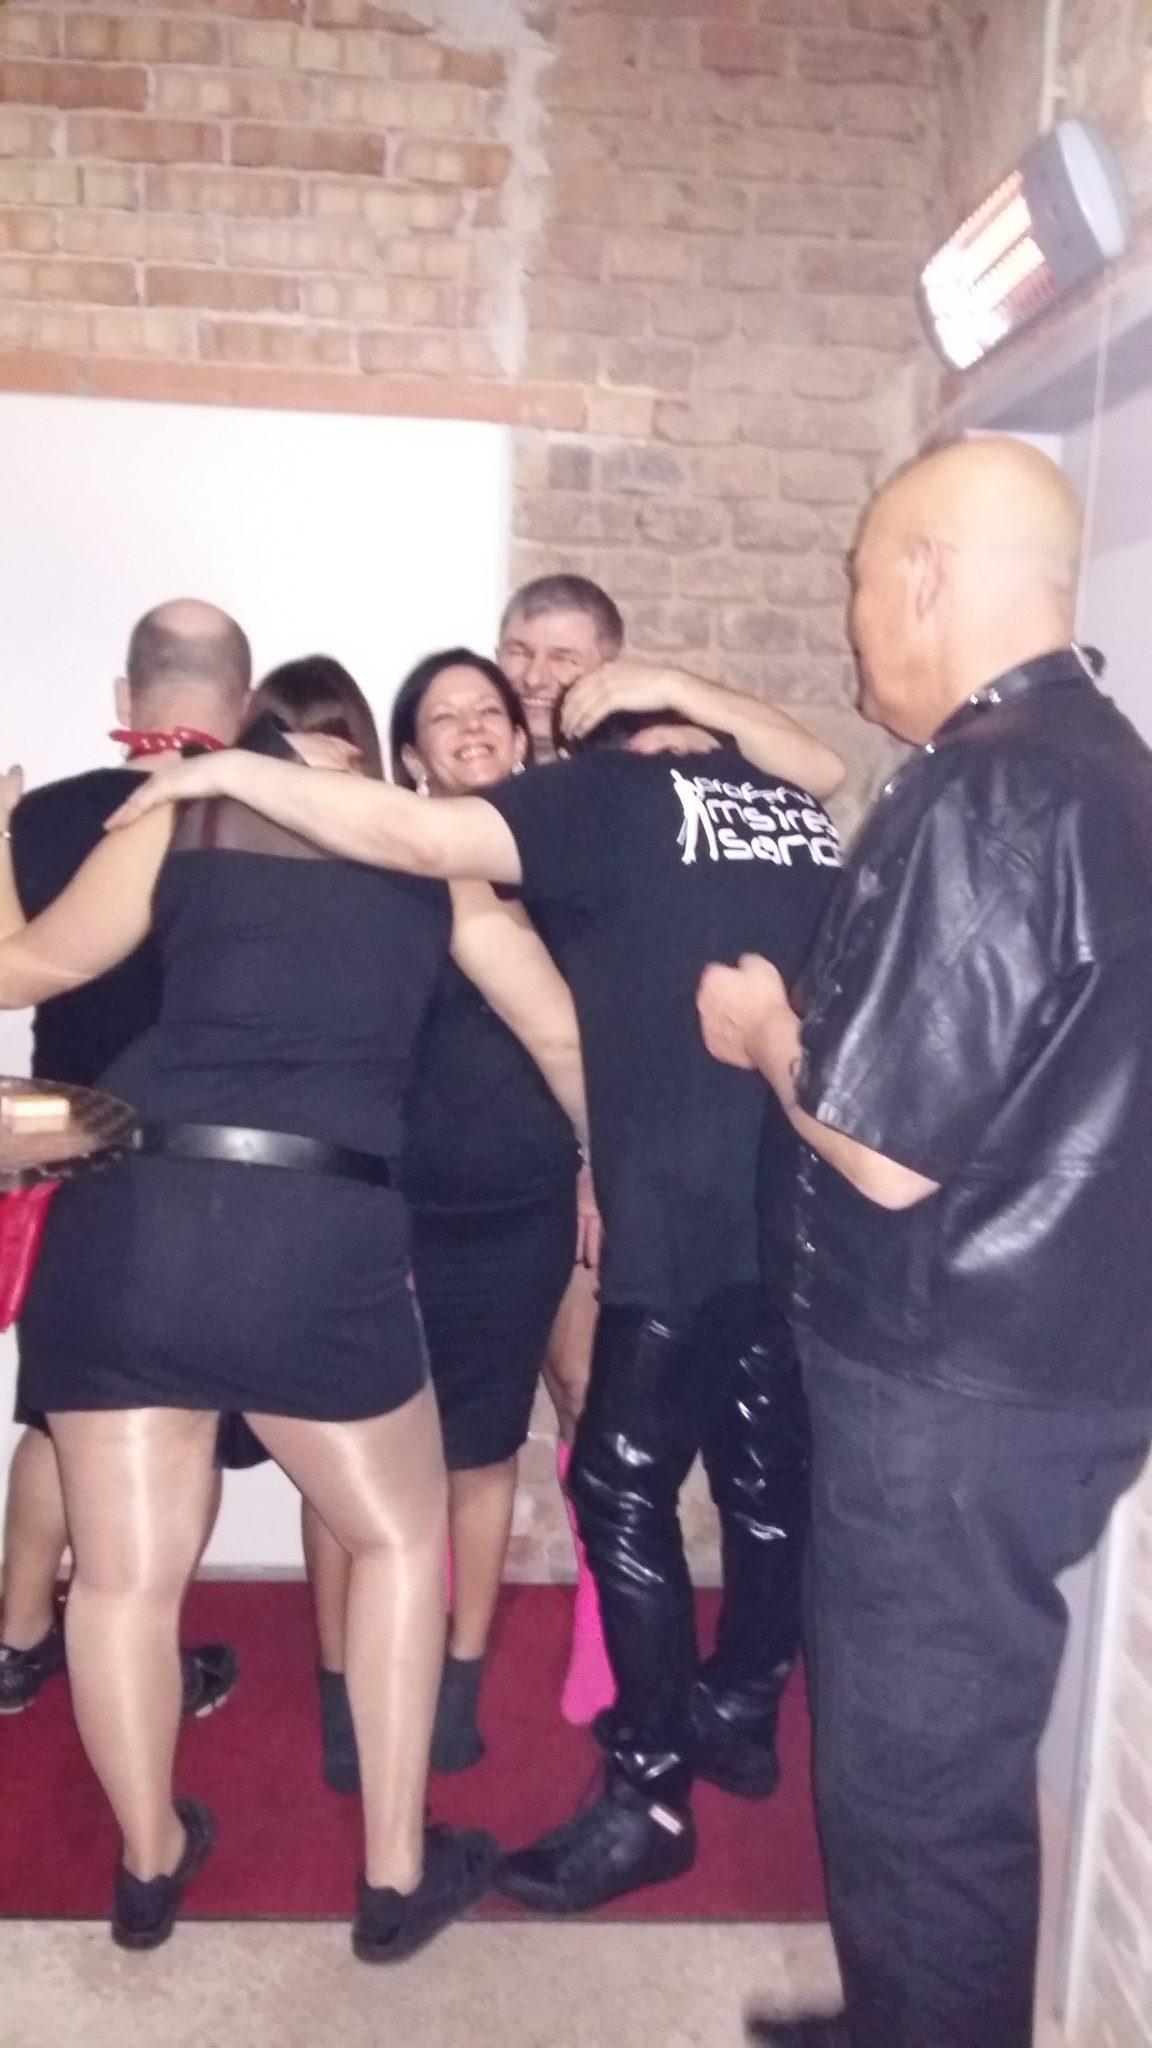 bdsm vdeos sexfilme gratis ohne anmeldung